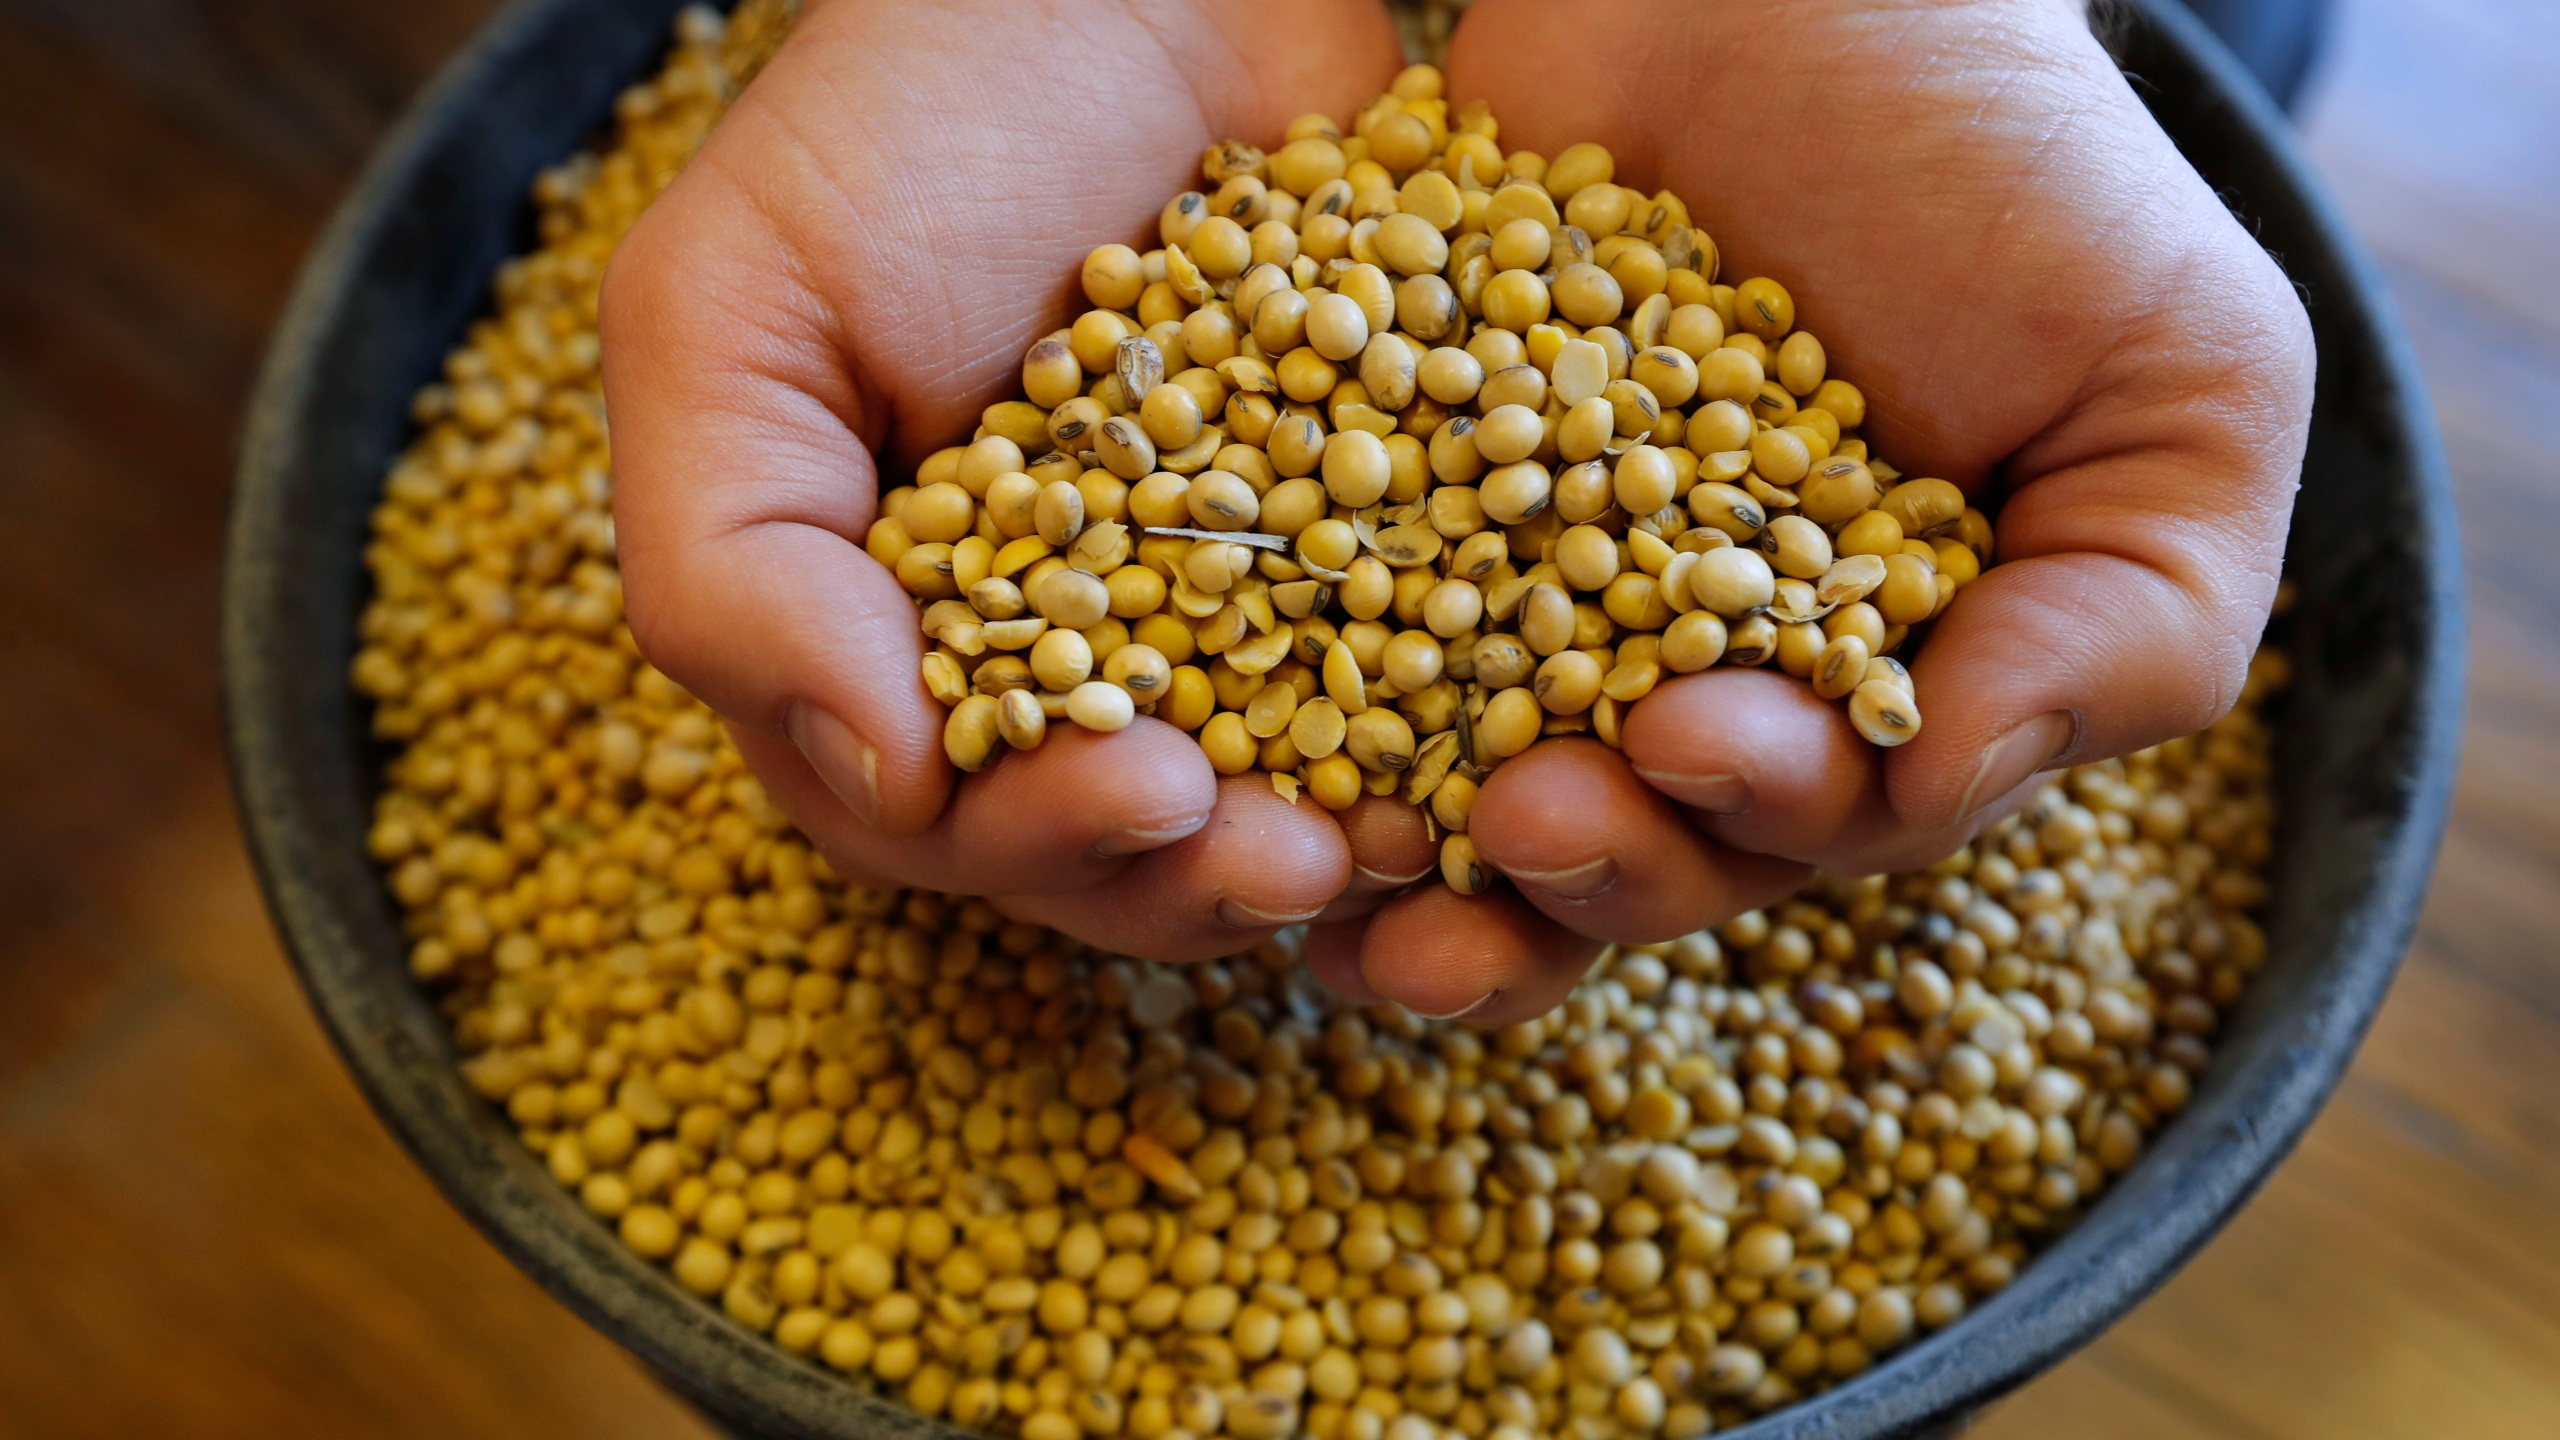 Soybean_Surplus_Tariffs_25780-159532.jpg68835793